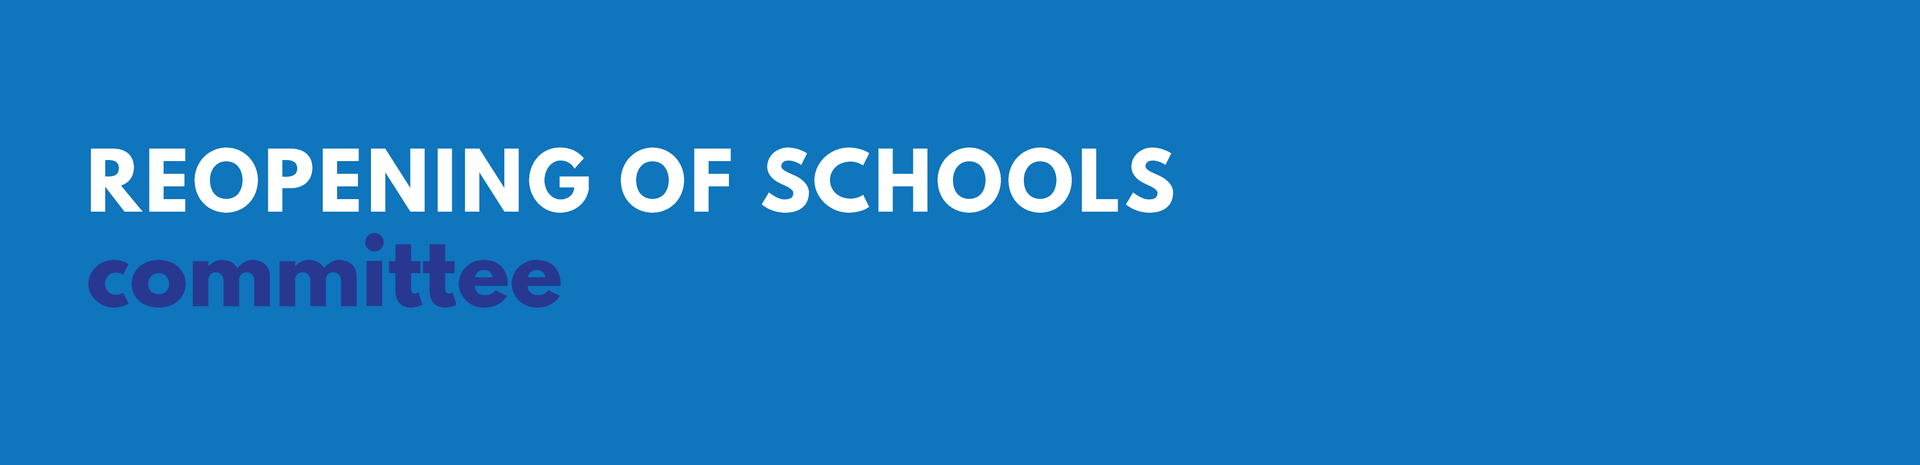 Reopening of School Committee